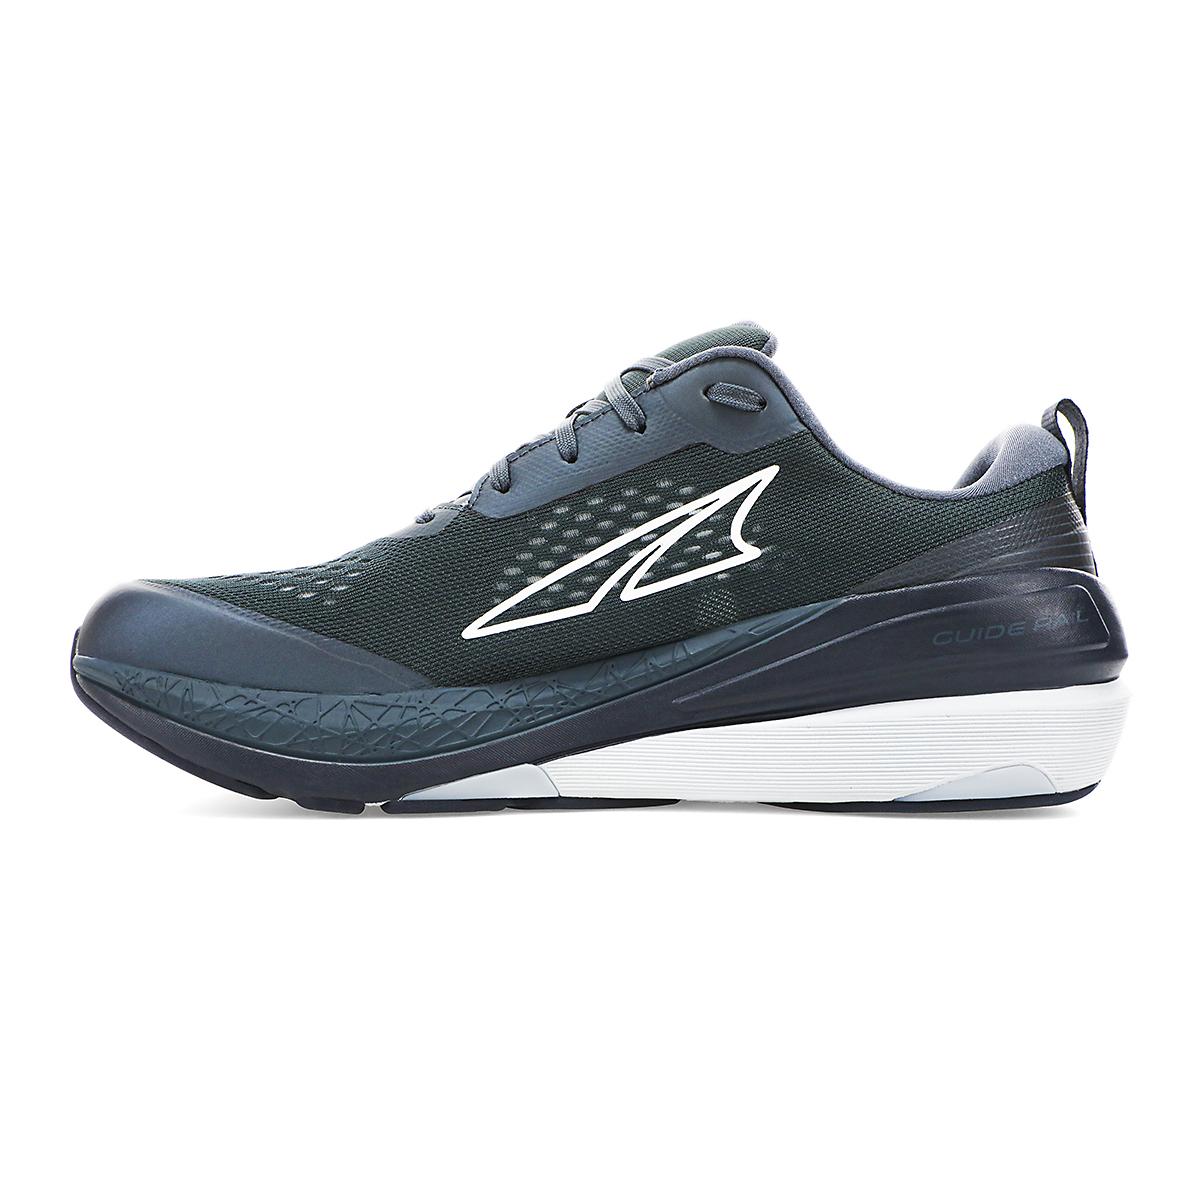 Men's Altra Paradigm 5 Running Shoe - Color: Dark Blue - Size: 7 - Width: Regular, Dark Blue, large, image 2